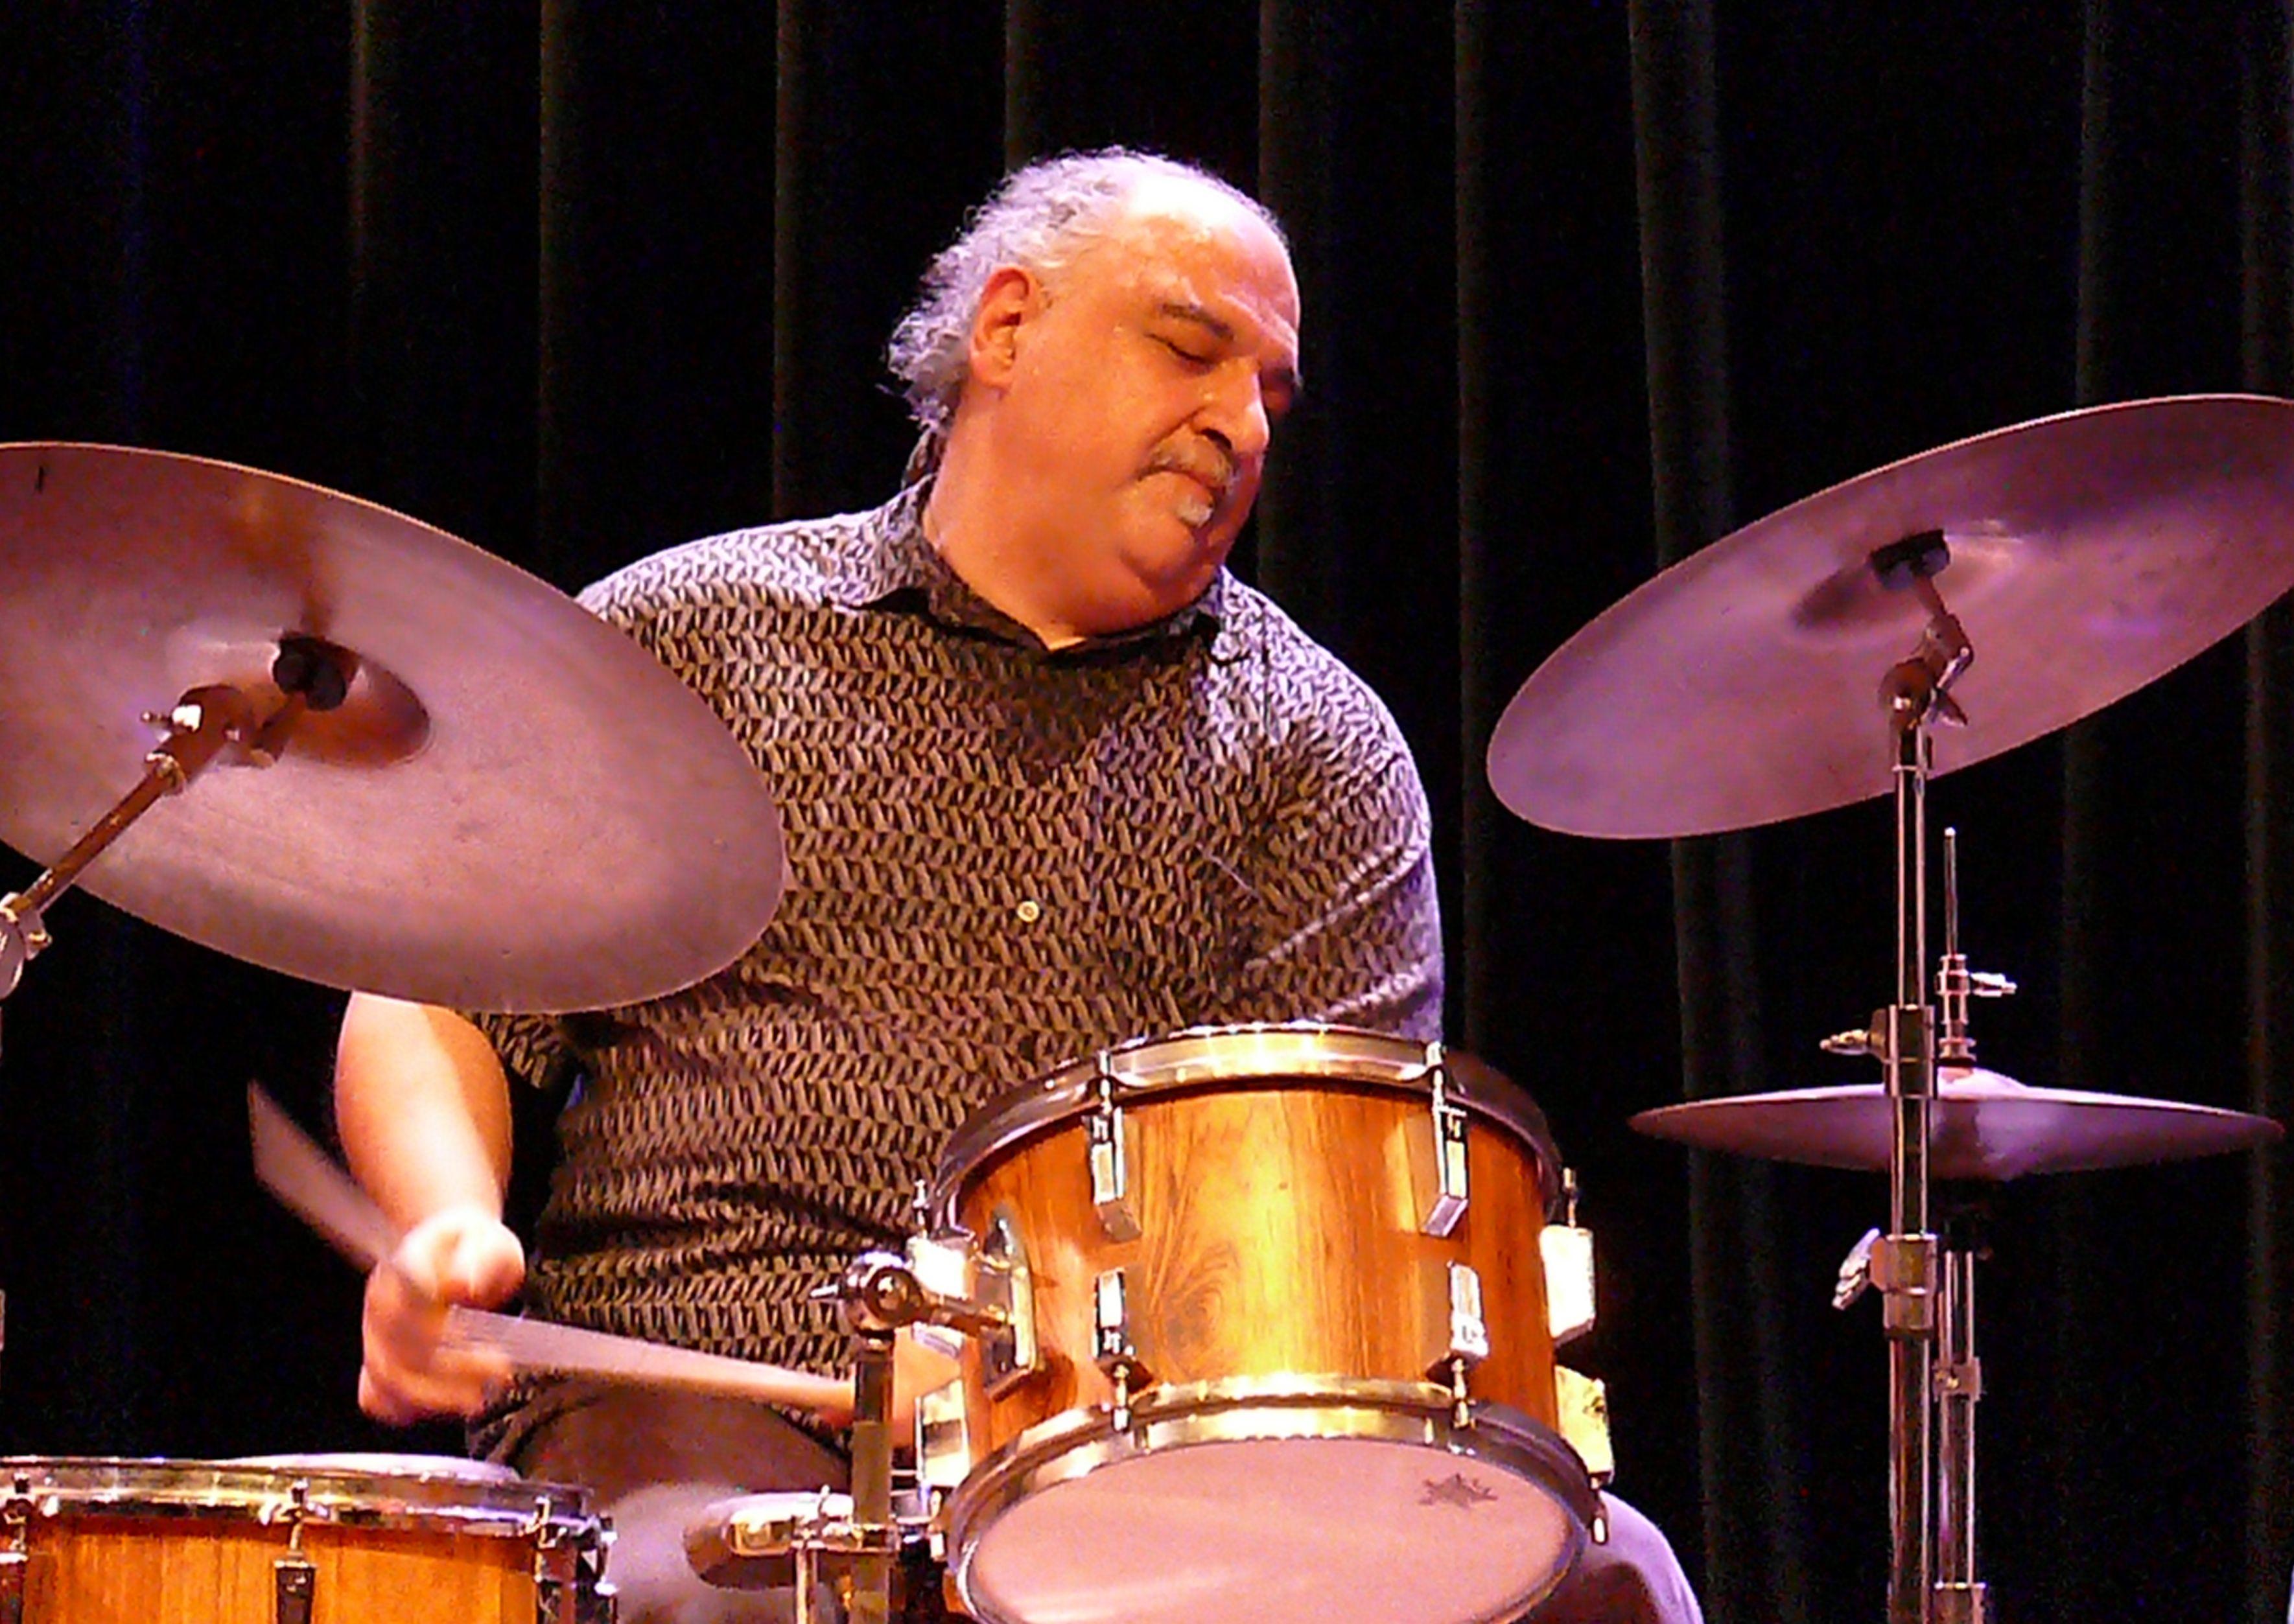 Michael Zerang at the Bimhuis in Amsterdam, 13 February 2009